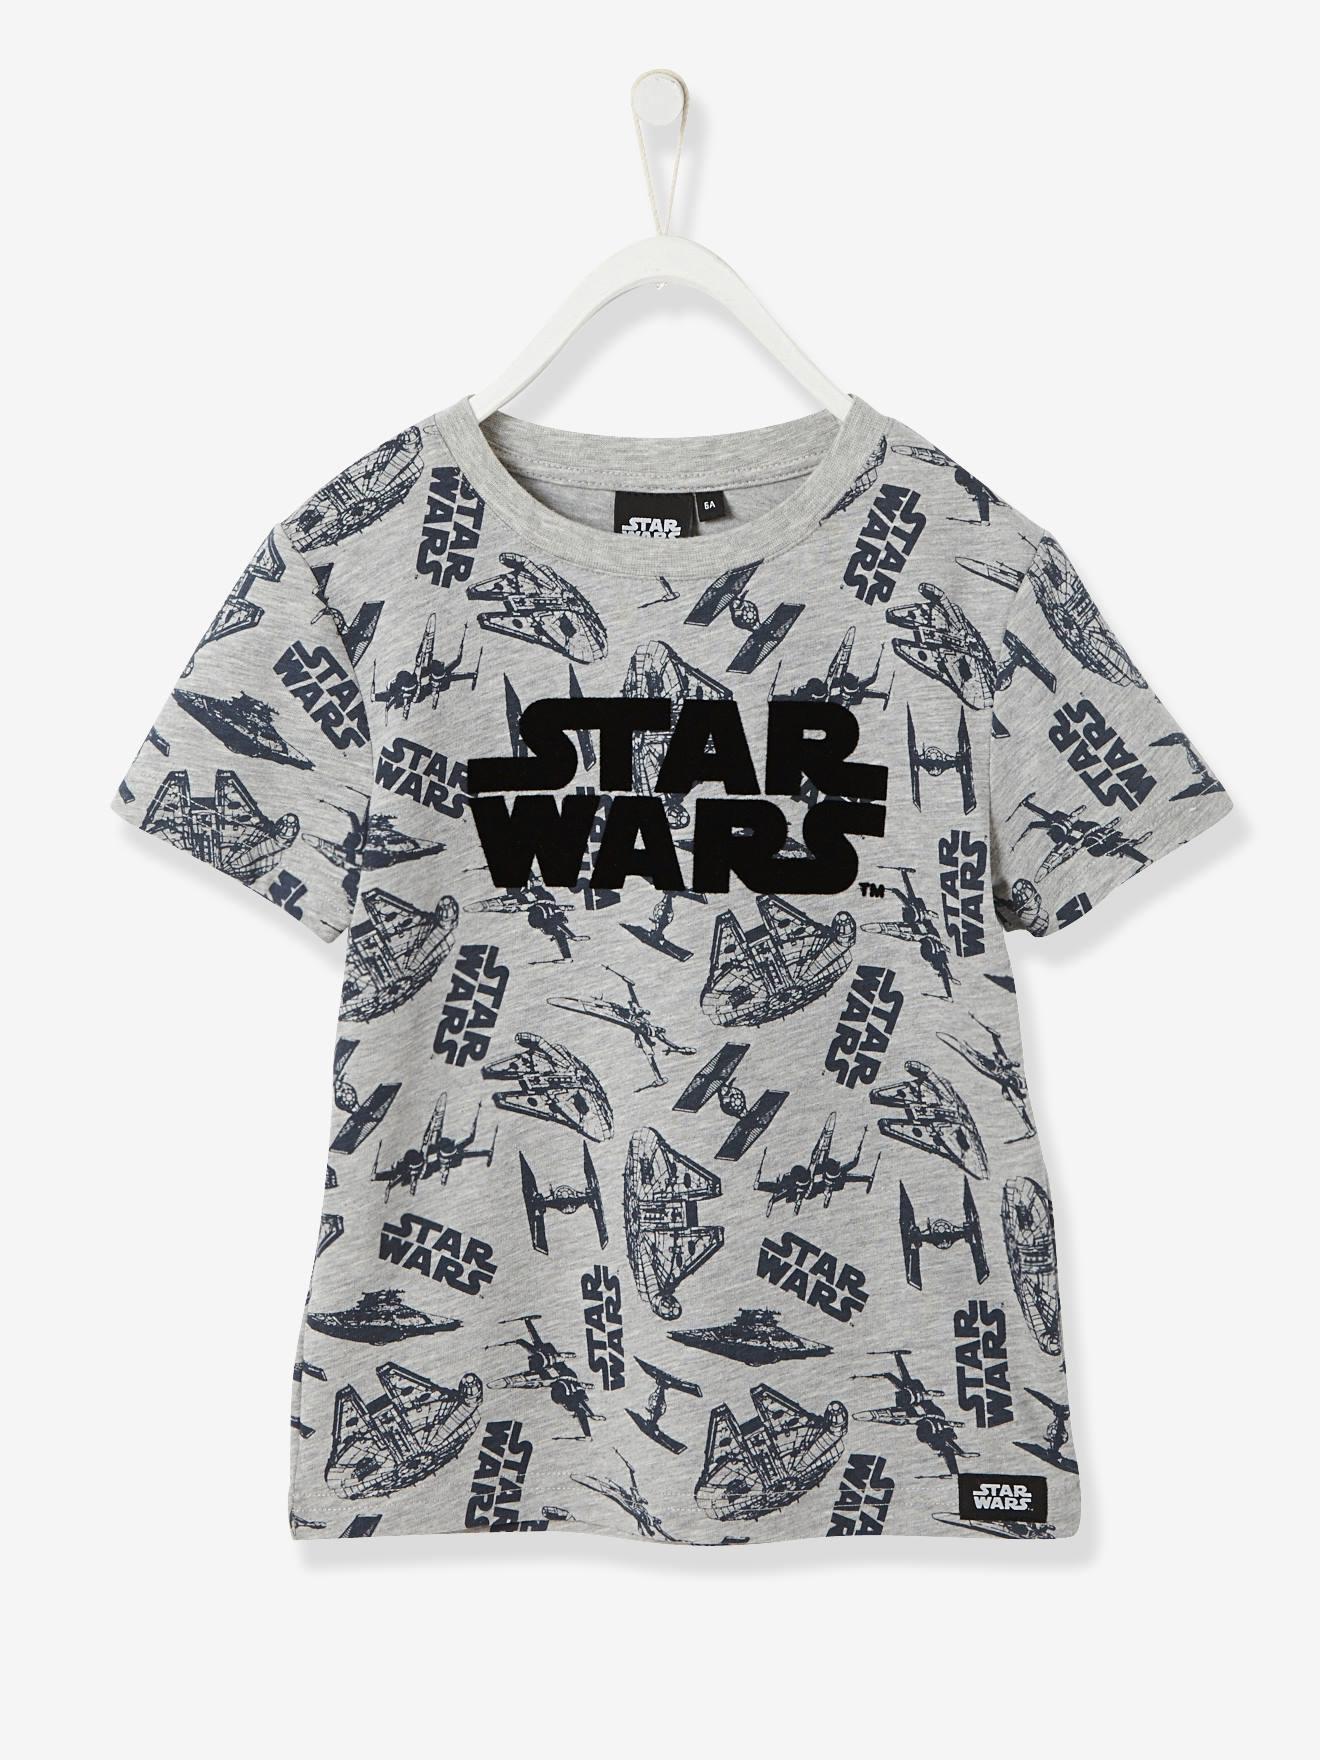 SOLDES - T-shirt garçon Star Wars® manches courtes gris chiné